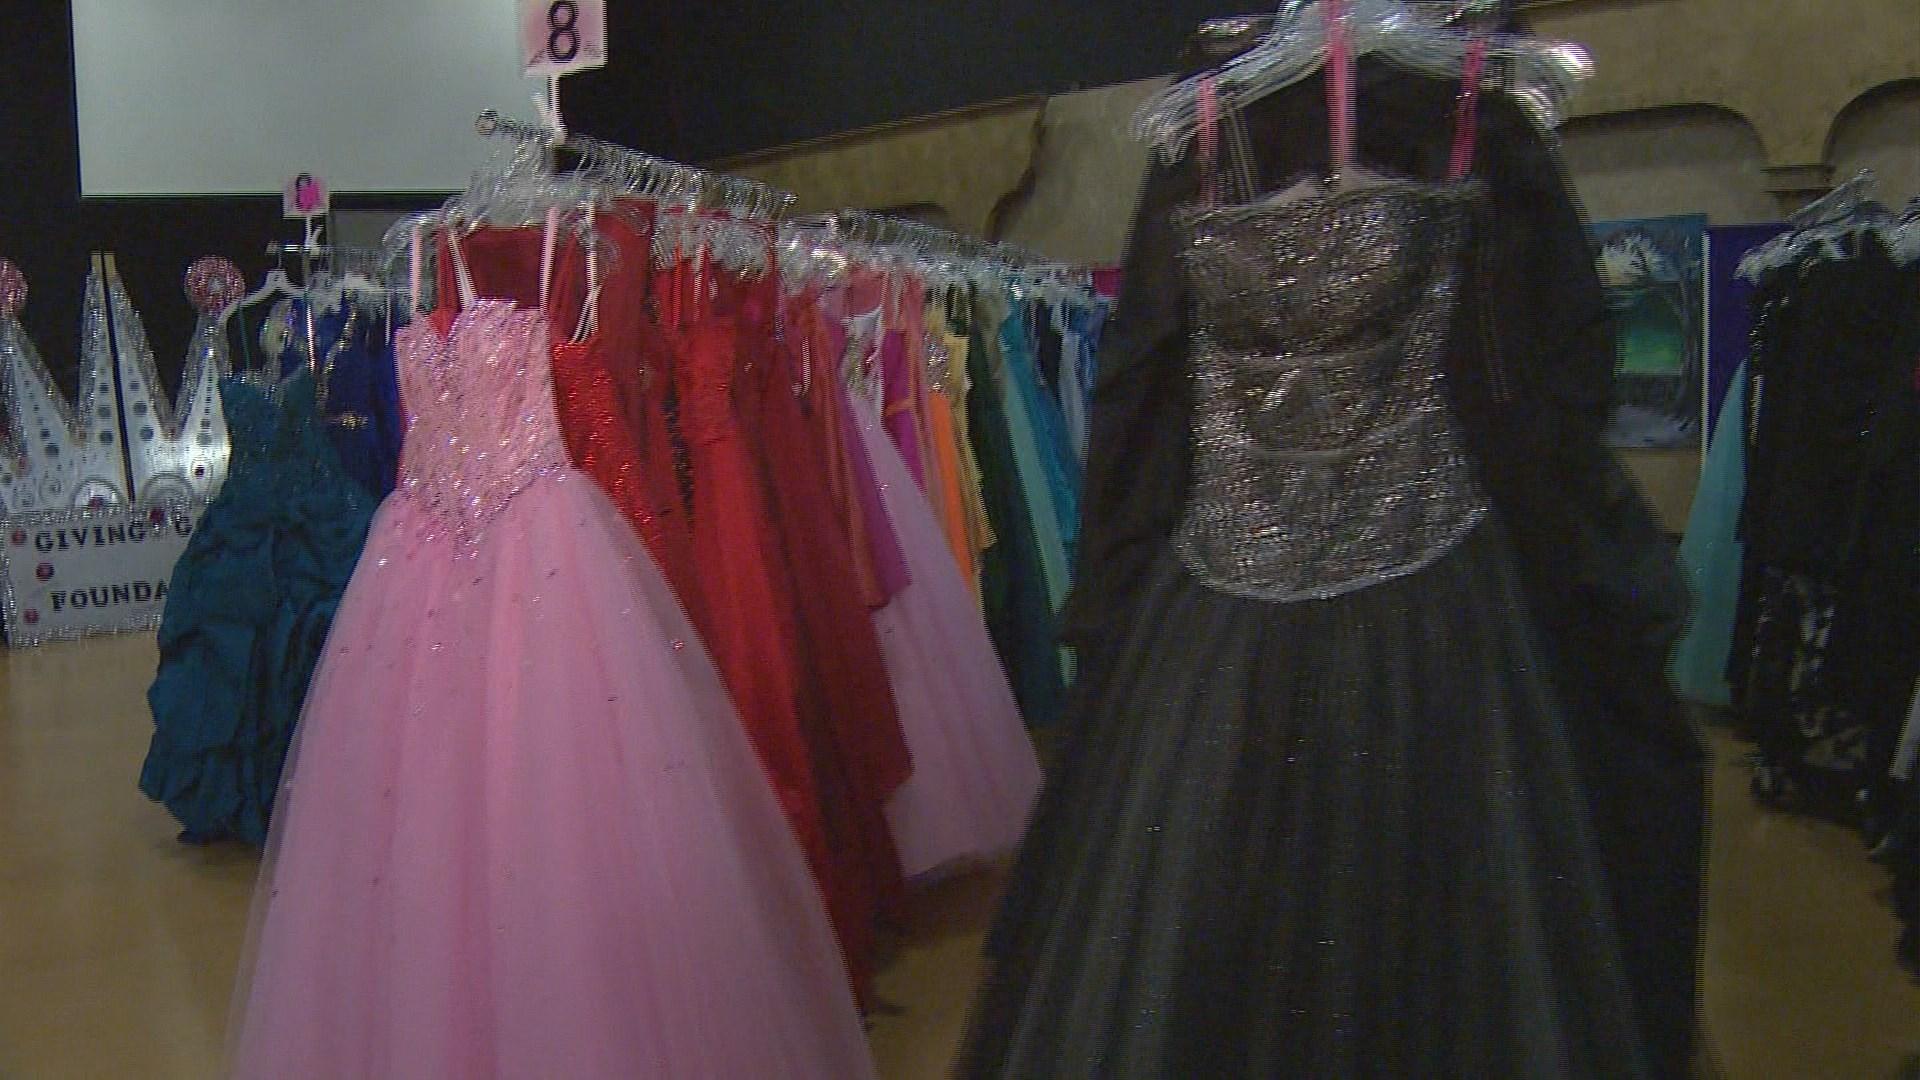 Donation program gives girls dream prom dresses for free ...